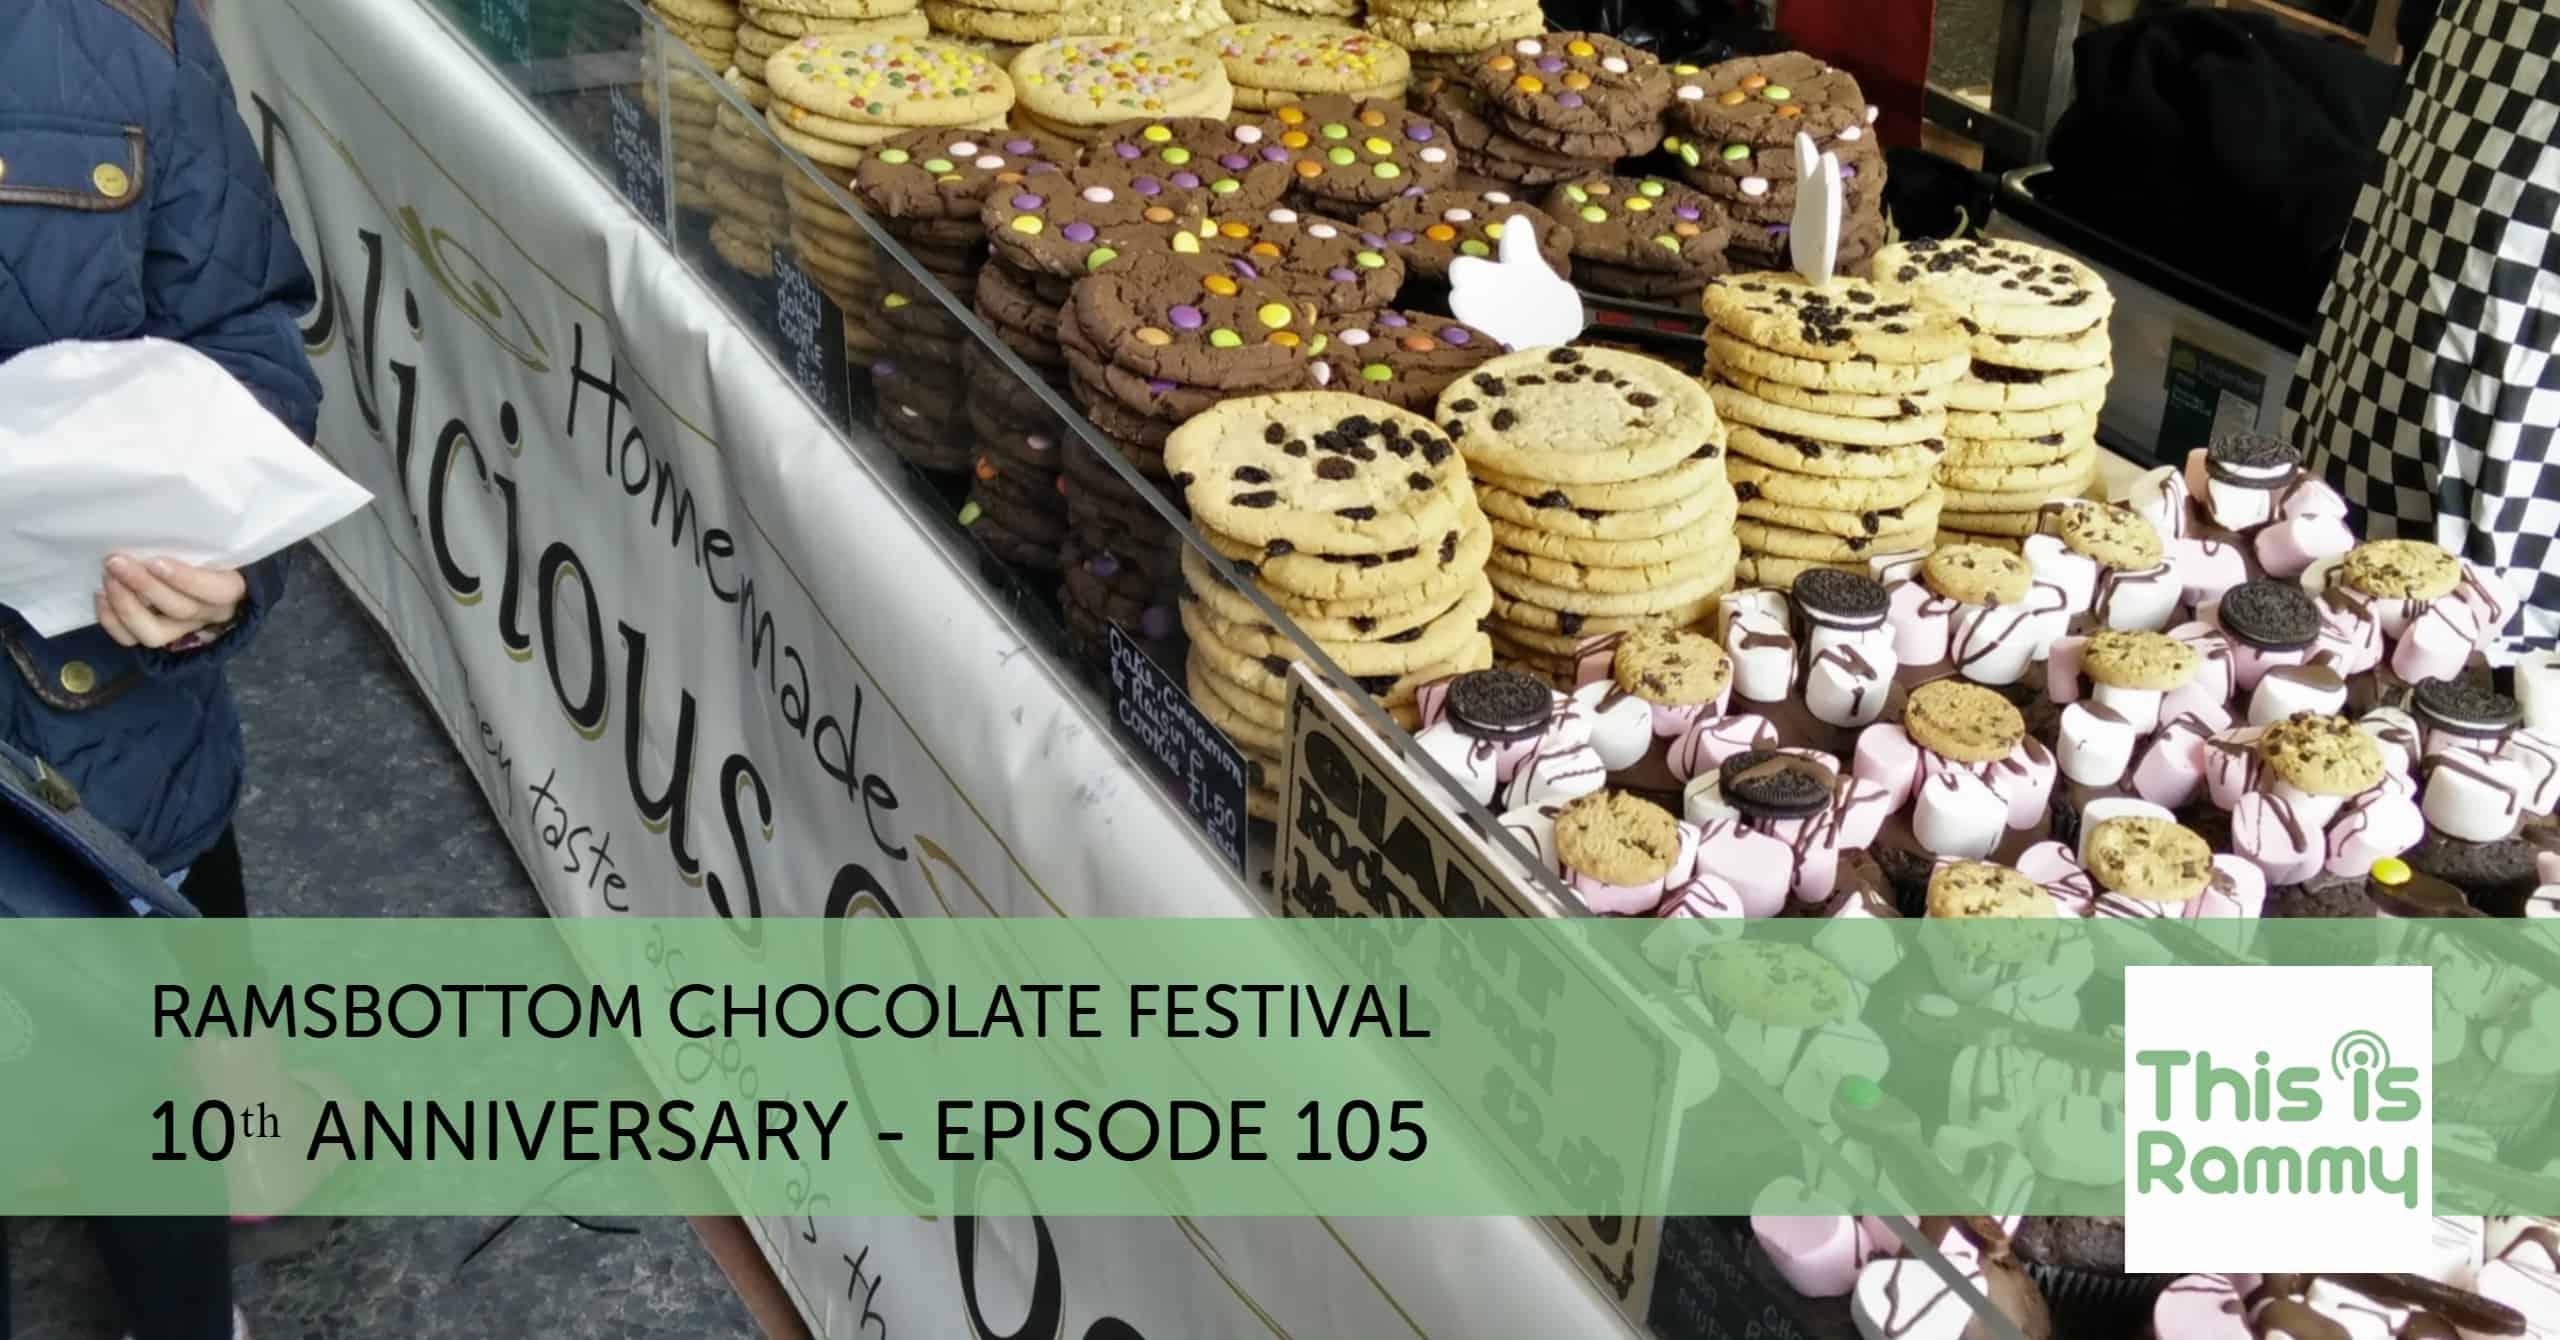 10th Anniversary Of Ramsbottom Chocolate Festival Episode